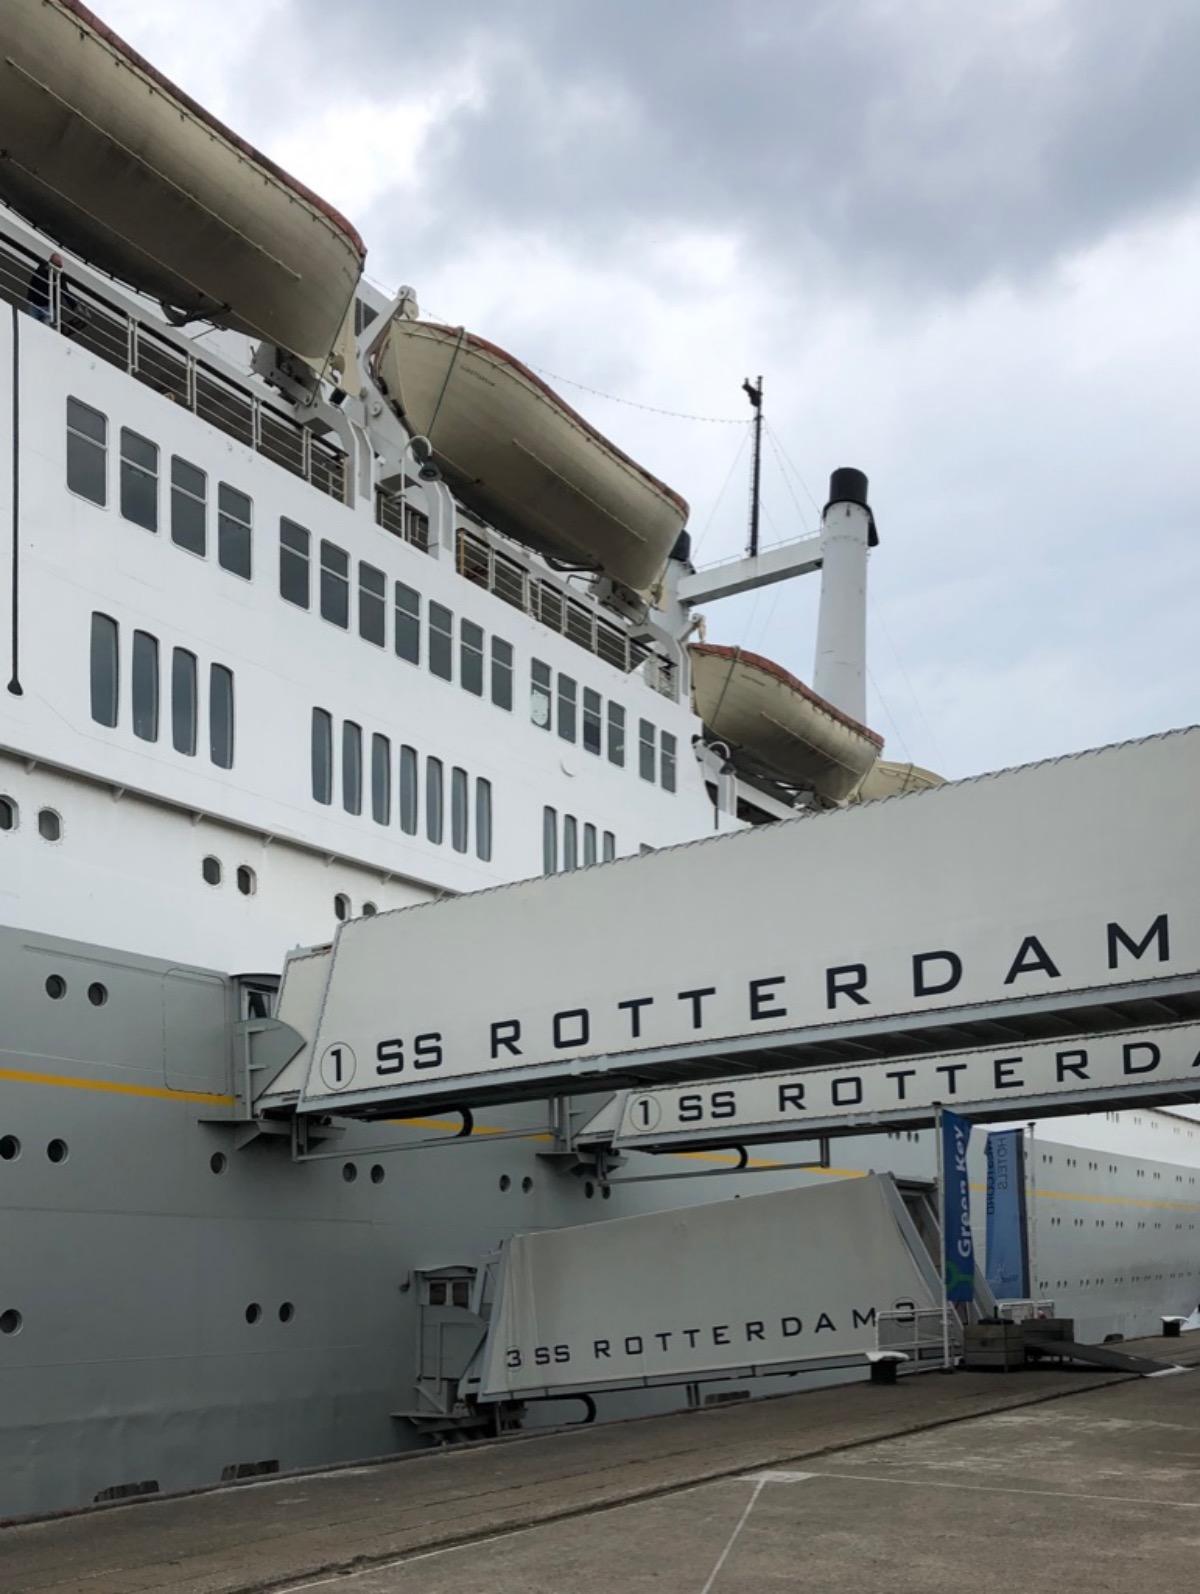 StarsStripesAndMayonnaise_Rotterdam_1194